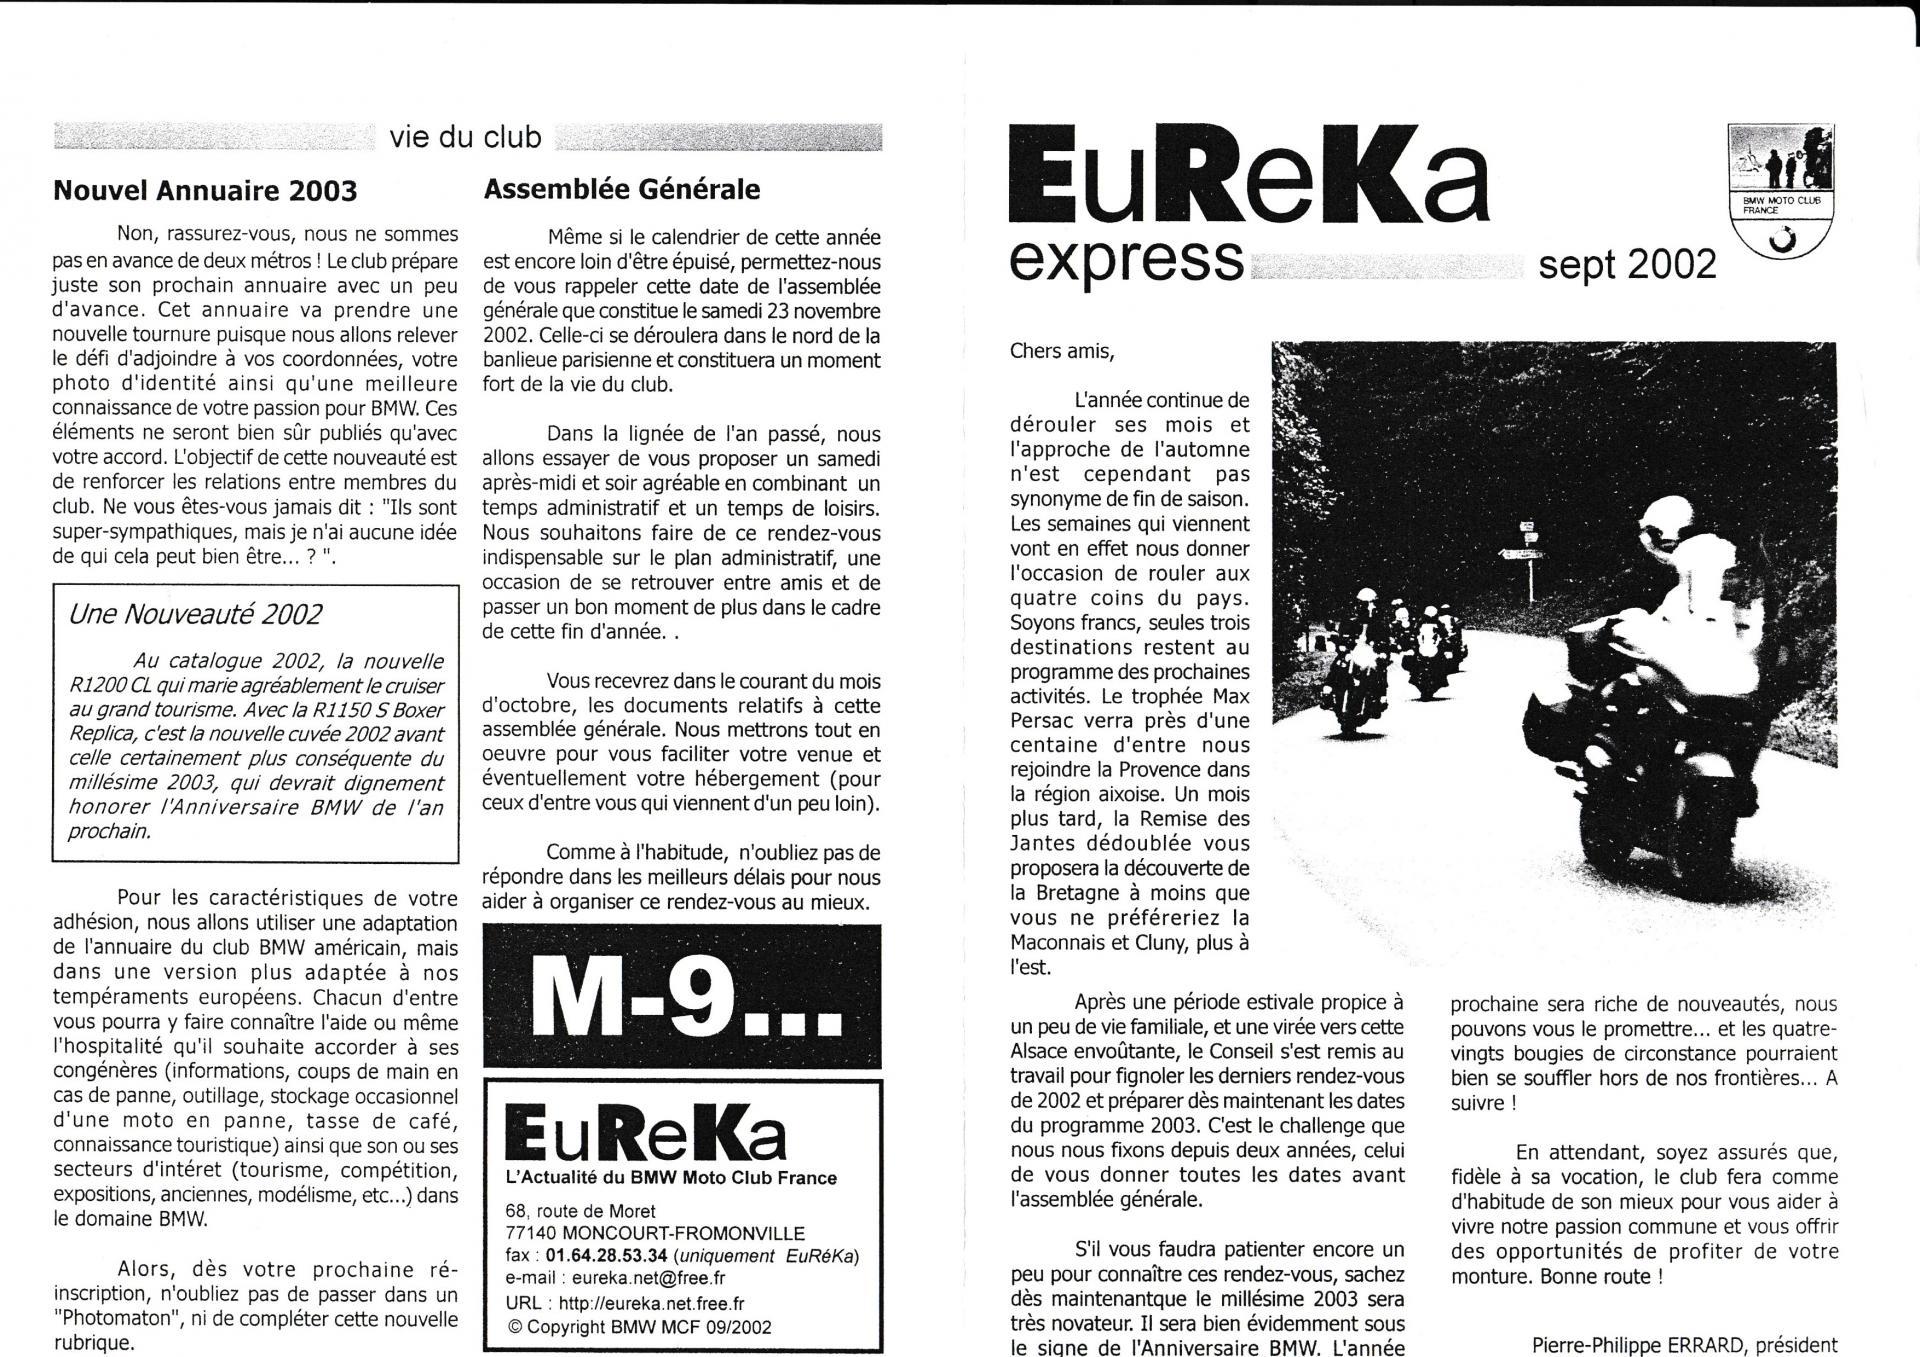 Eureka express septembre 2002 1